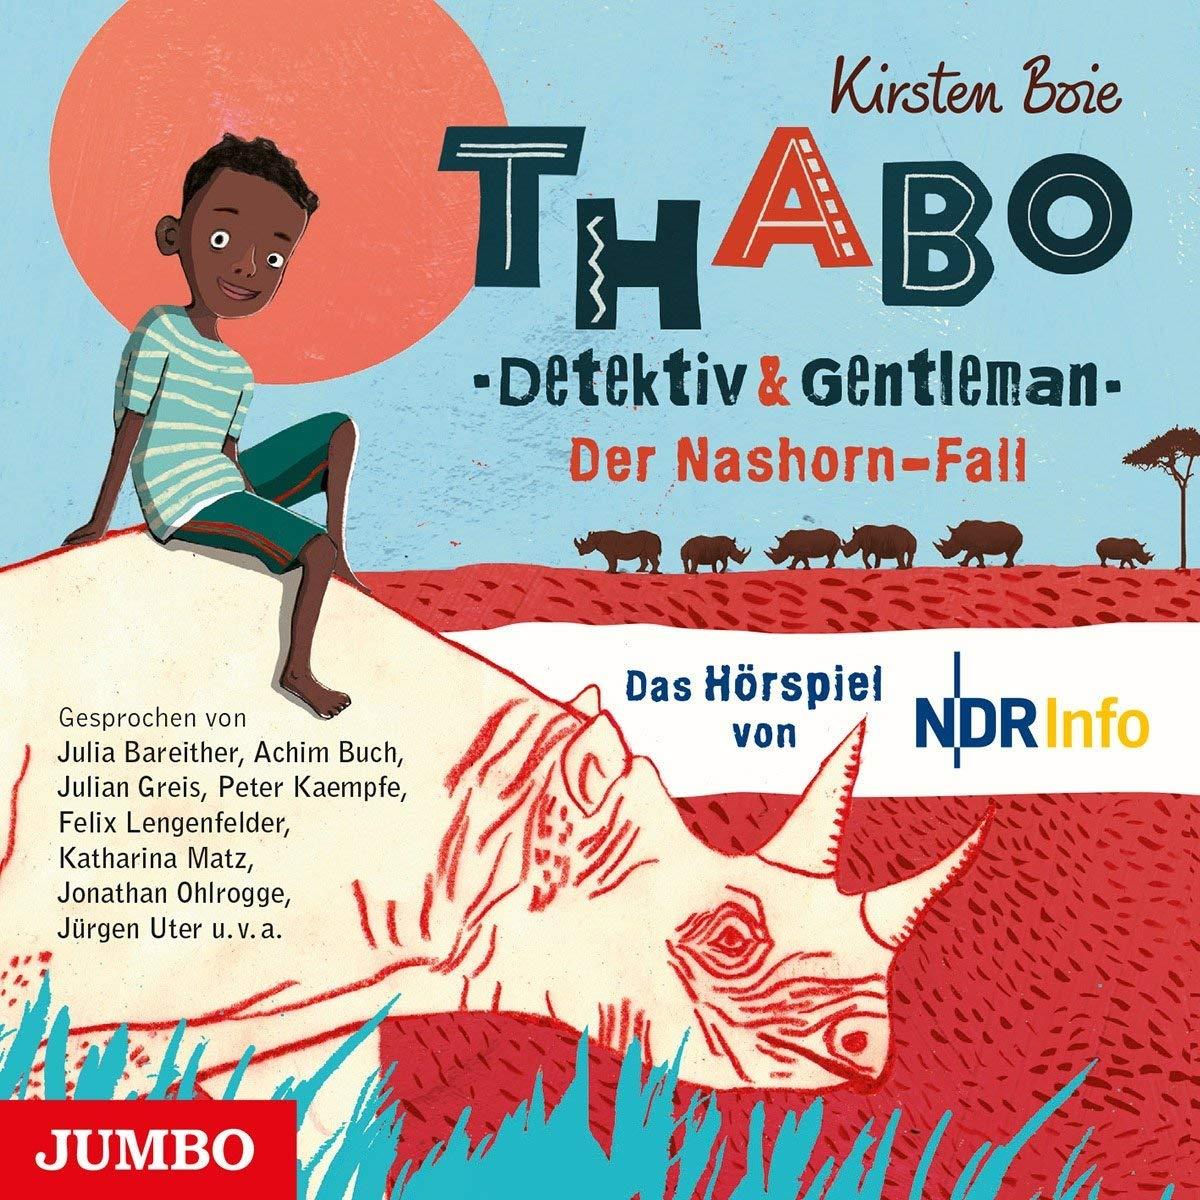 Thabo – Detektiv & Gentleman: Der Nashorn-Fall